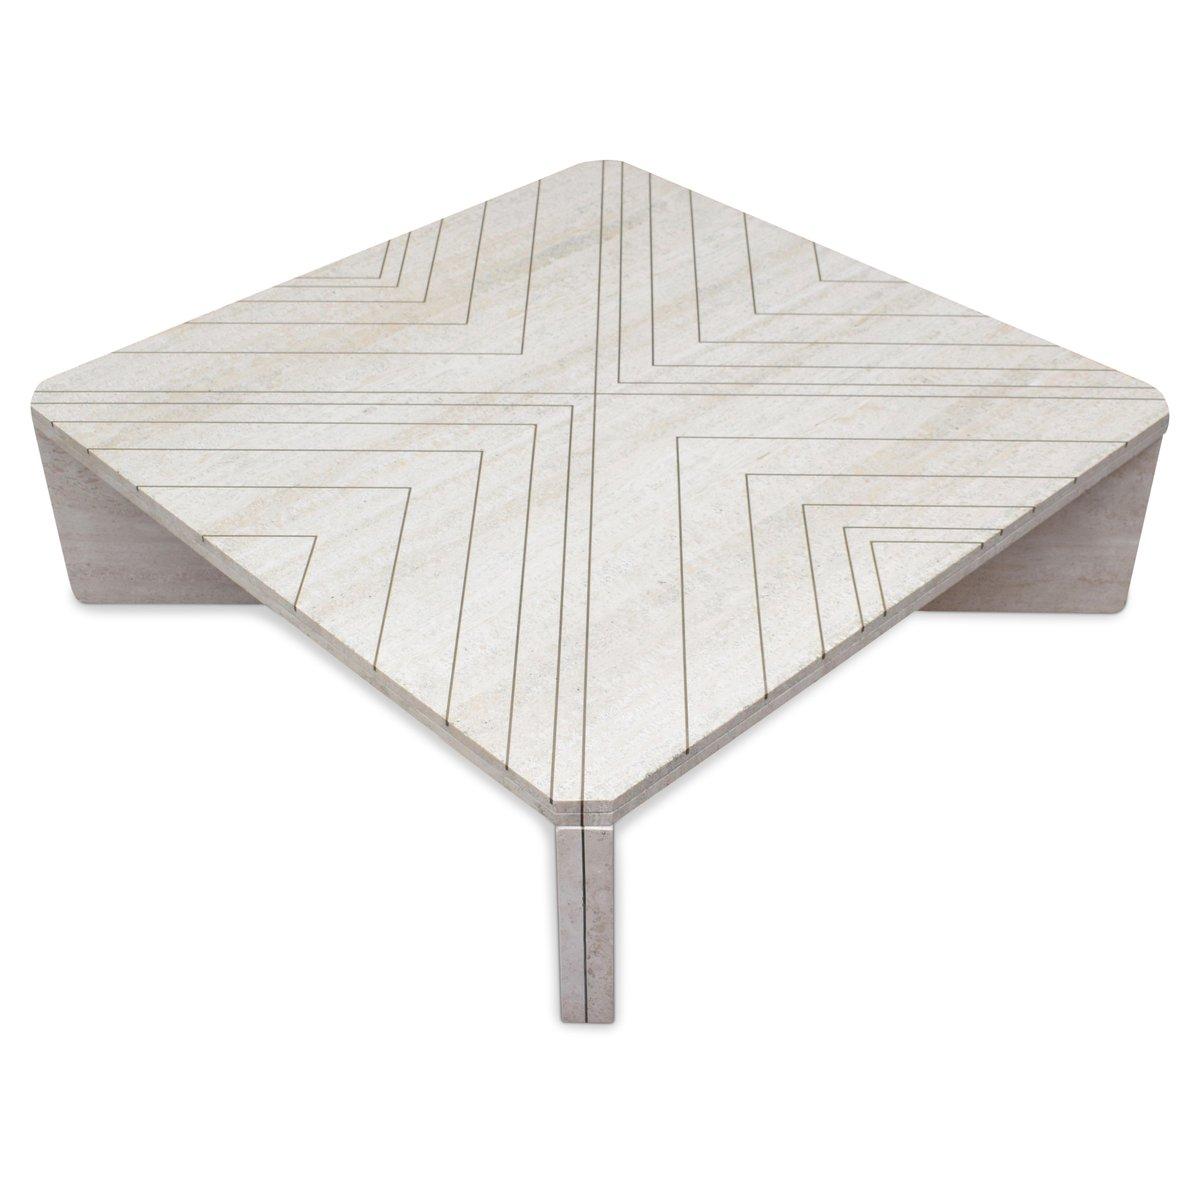 table basse en travertin laiton par willy rizzo italie 1970s en vente sur pamono. Black Bedroom Furniture Sets. Home Design Ideas